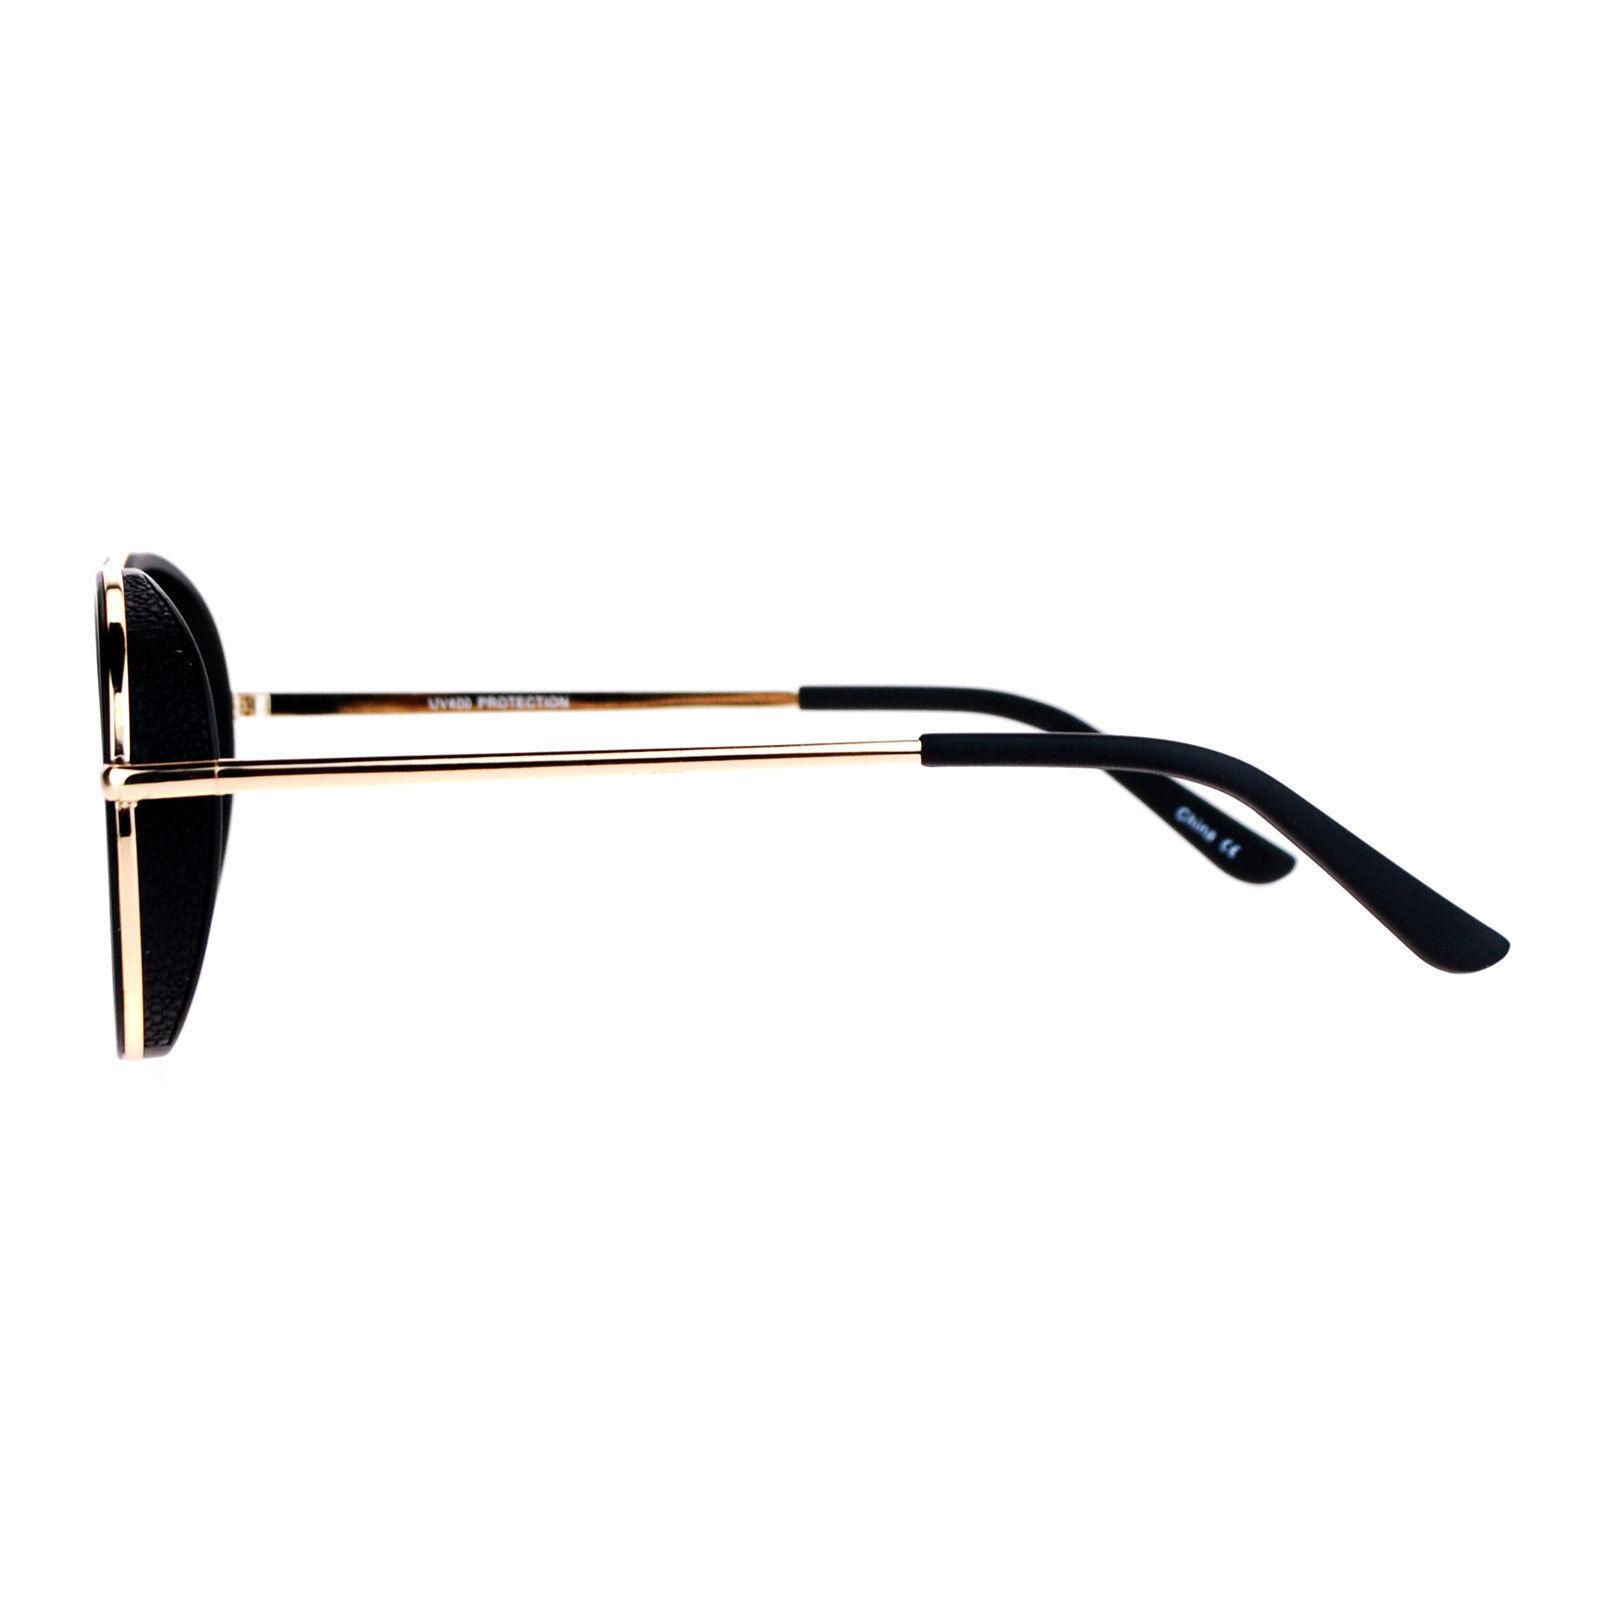 Flat Mirror Lens Sunglasses Designer Fashion Side Cover Aviators